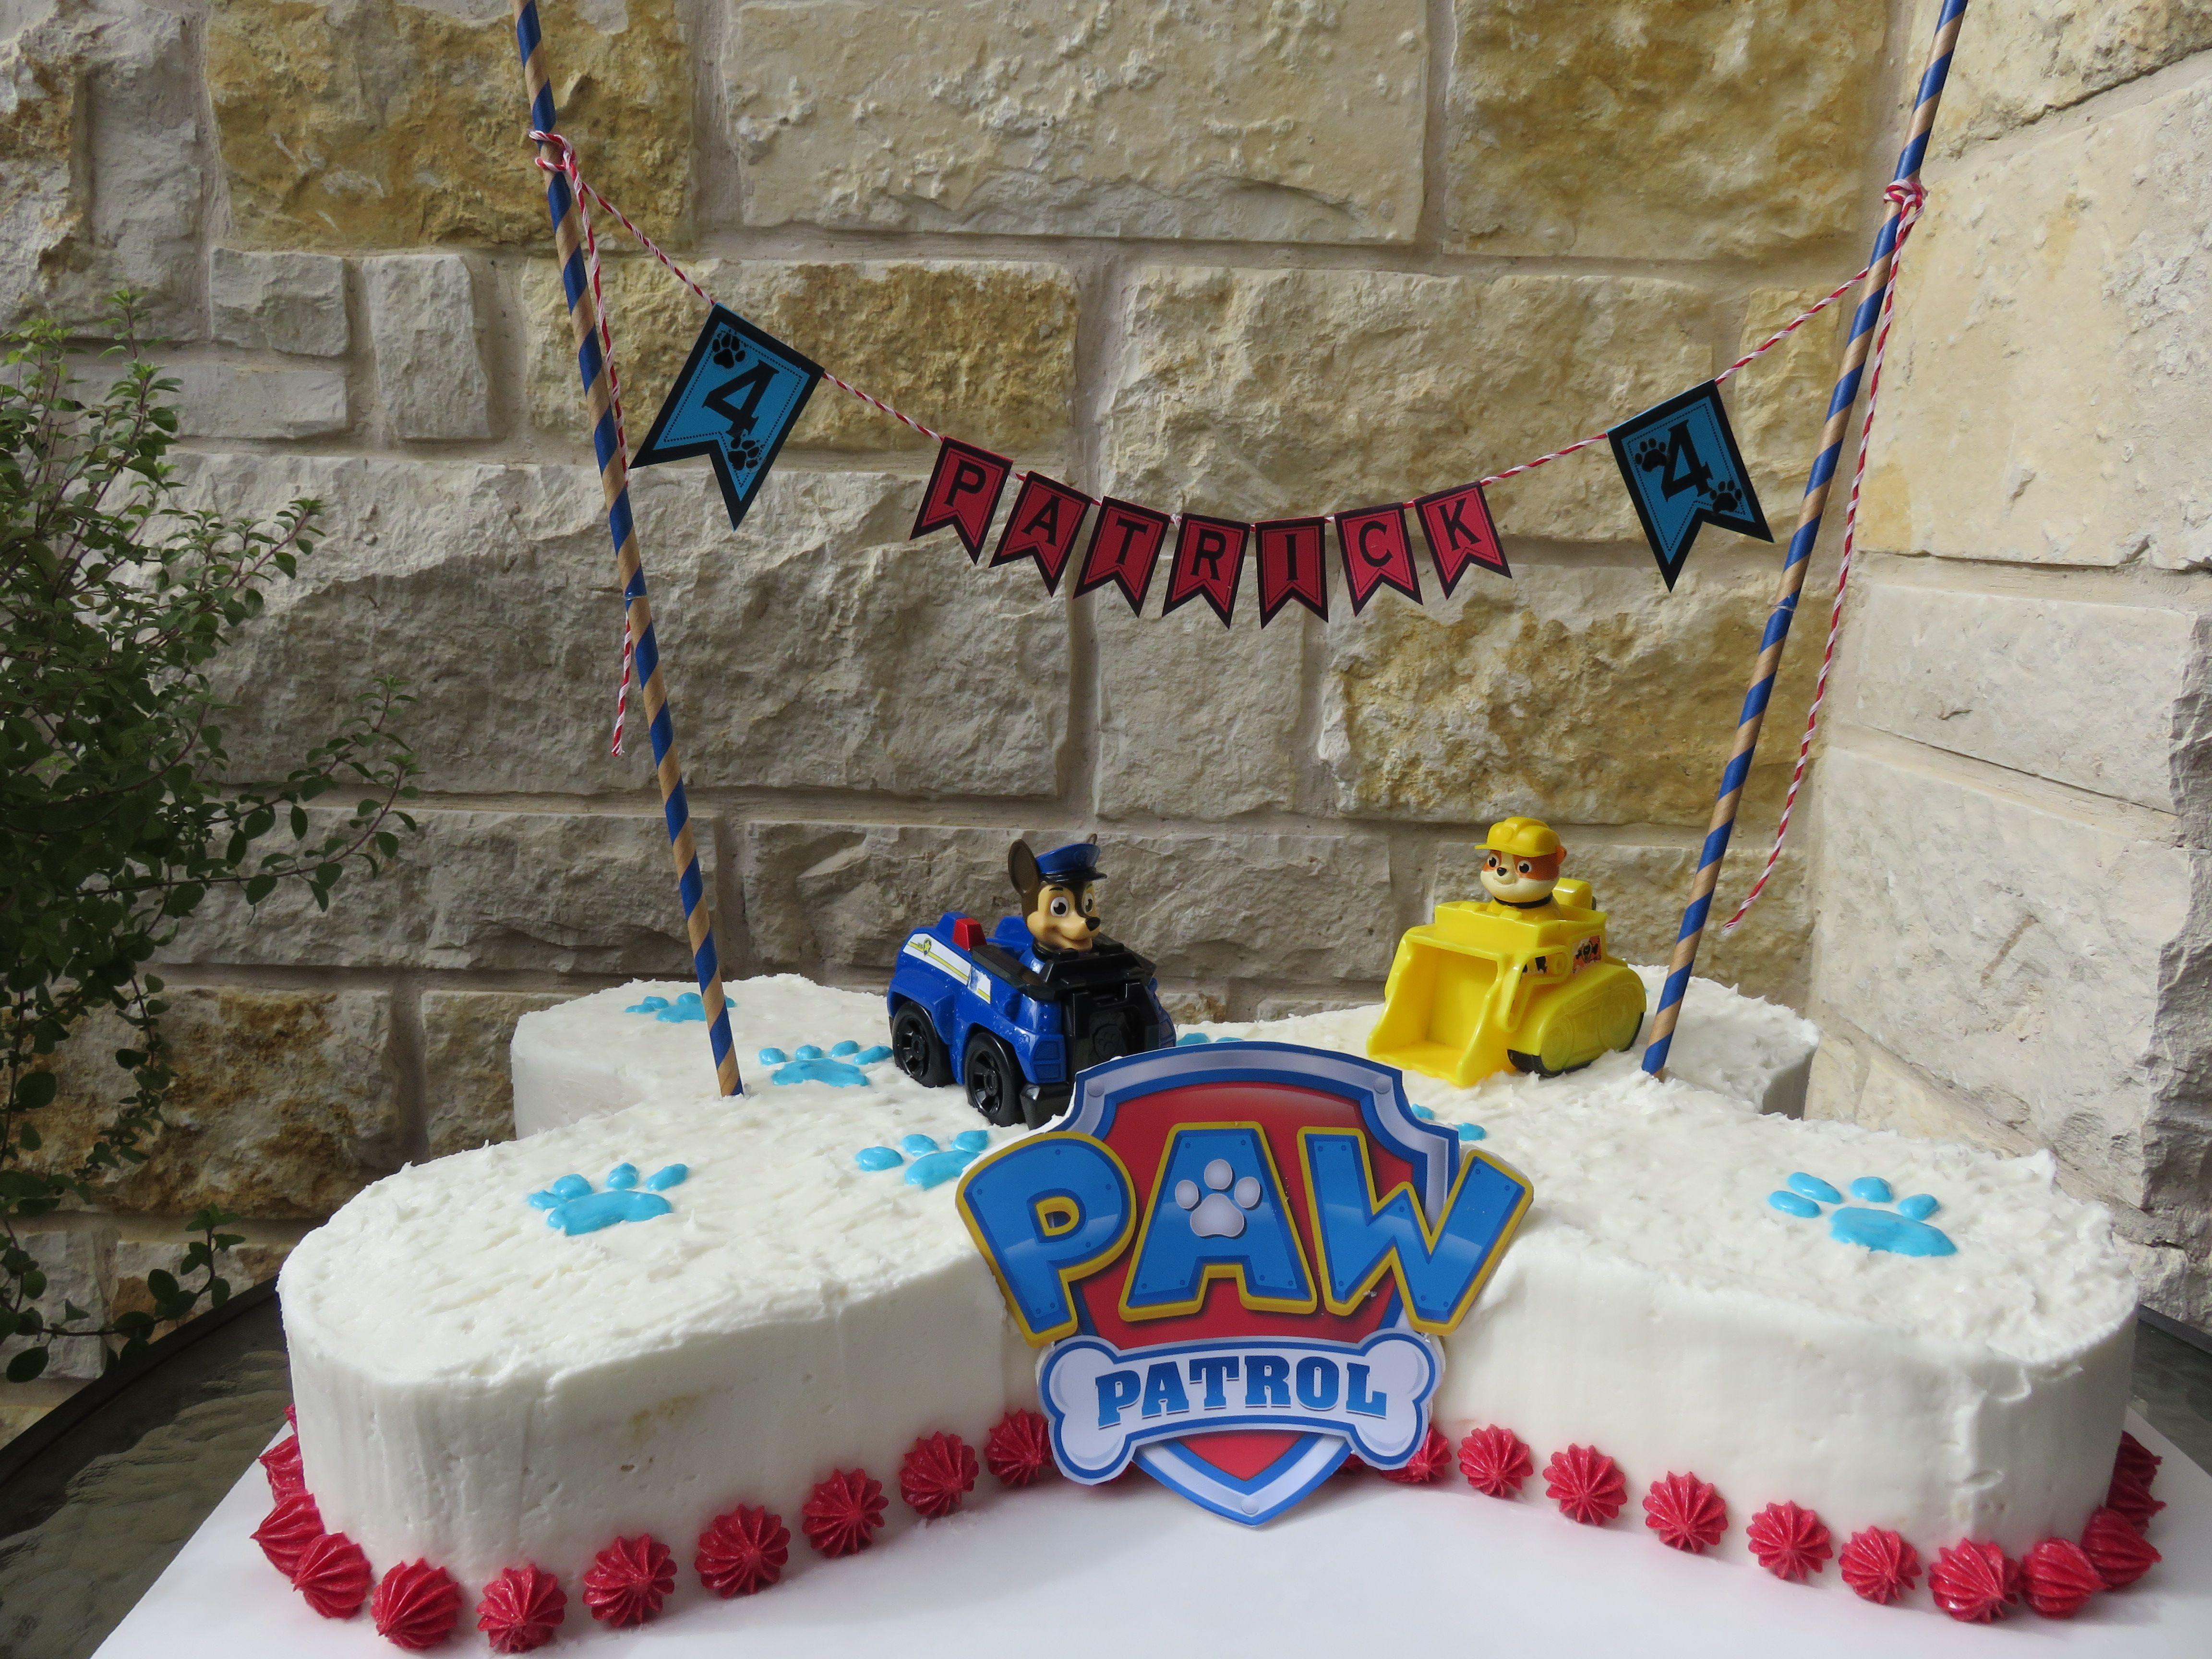 Paw Patrol Birthday Cake For 4 Year Old Boy Bone Shaped Paw Patrol Birthday Cake Boy Birthday Parties Paw Patrol Cake